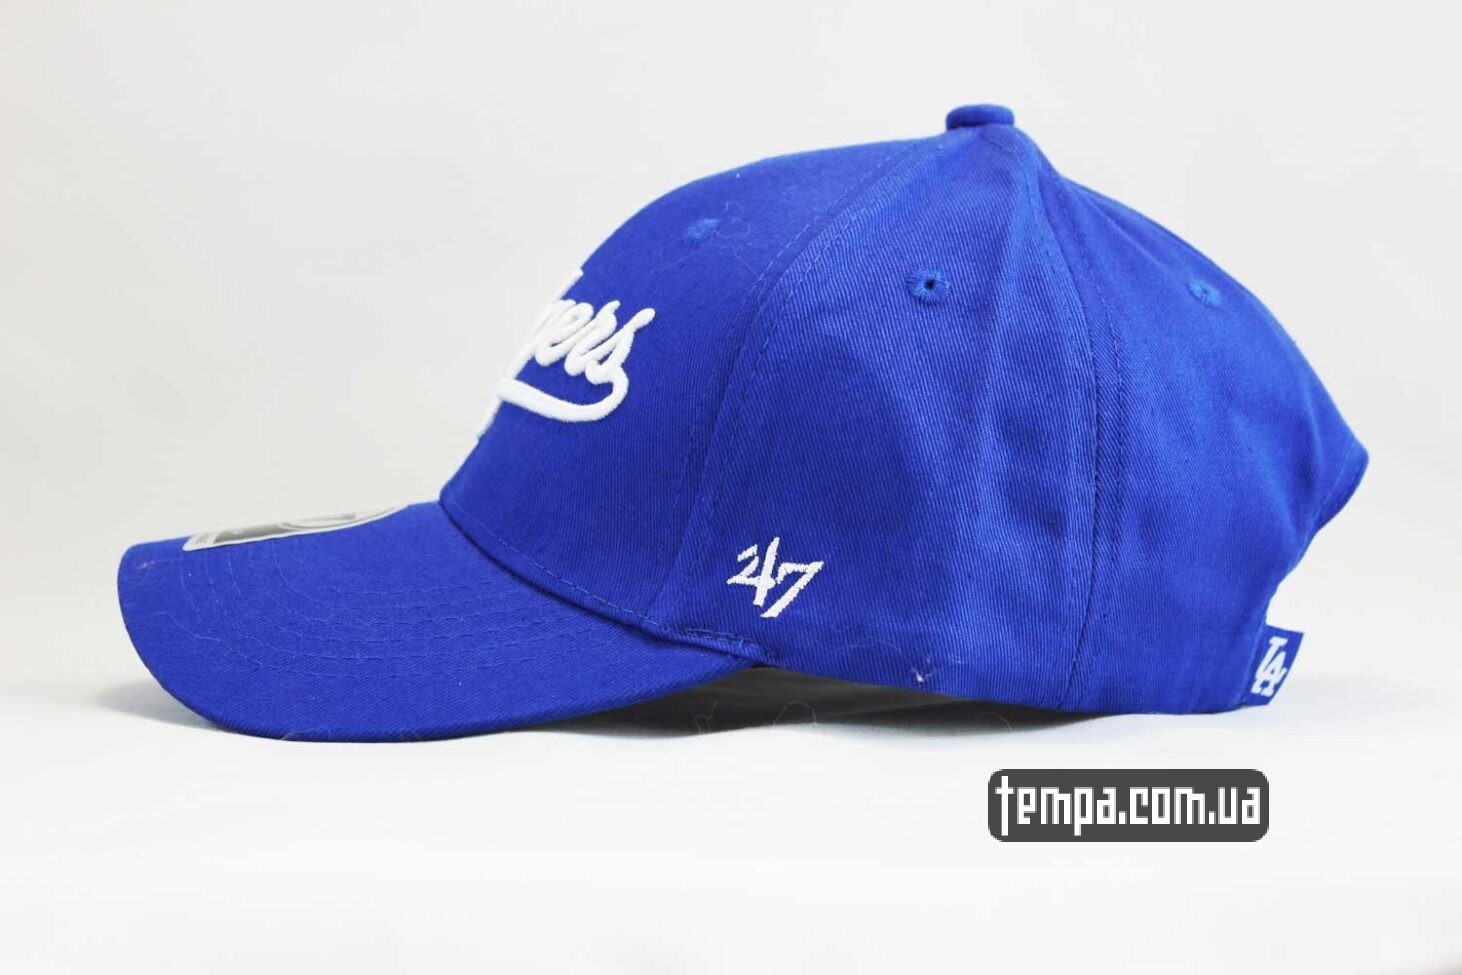 los angeles la кепка snapback бейсболка Dodgers 47 New Era синяя купить